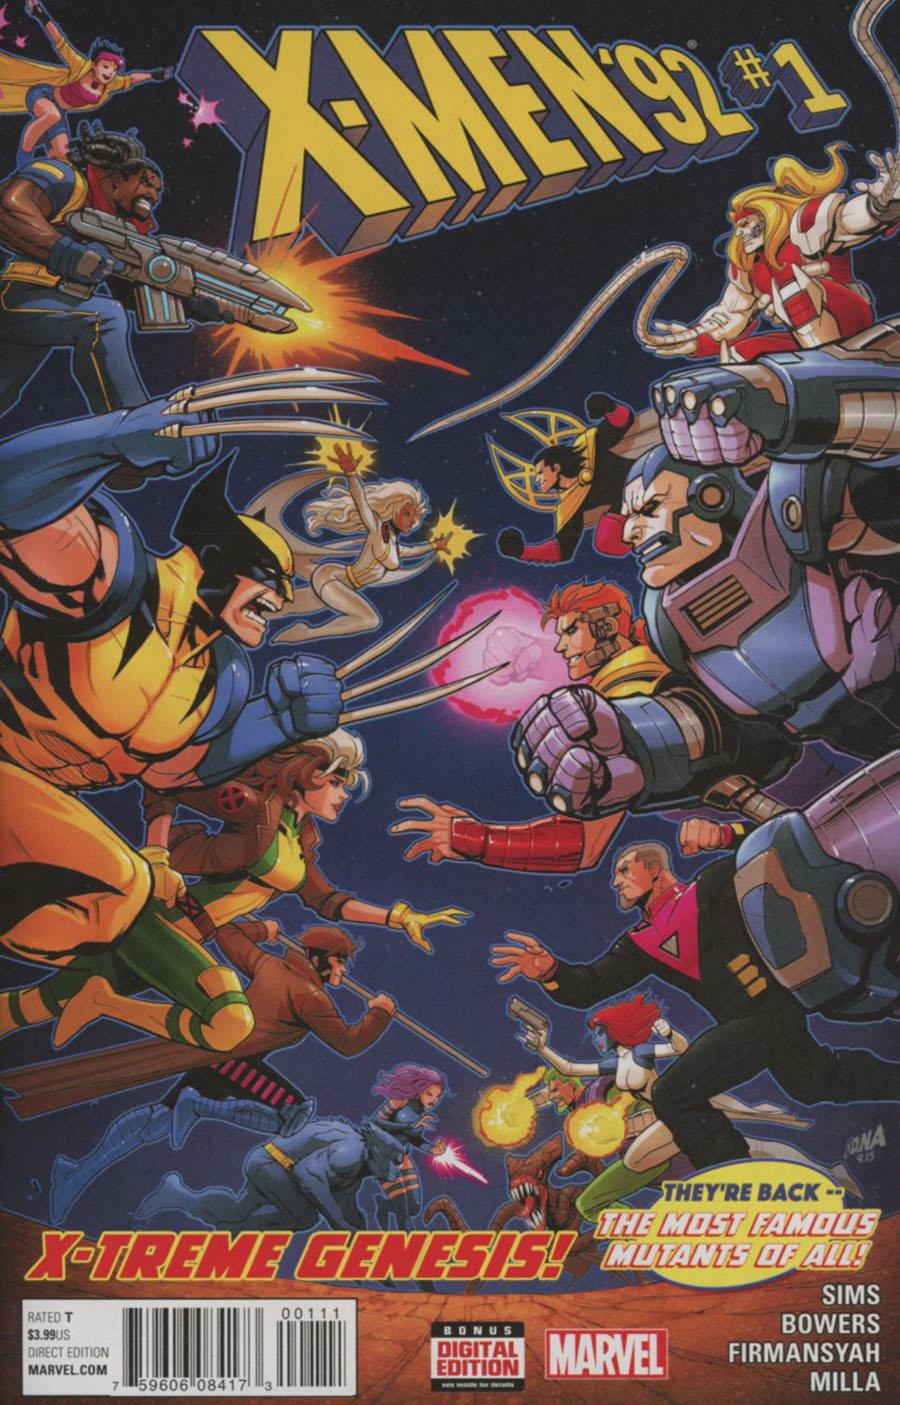 X-Men 92 Vol 2 #1 Cover A Regular David Nakayama Cover